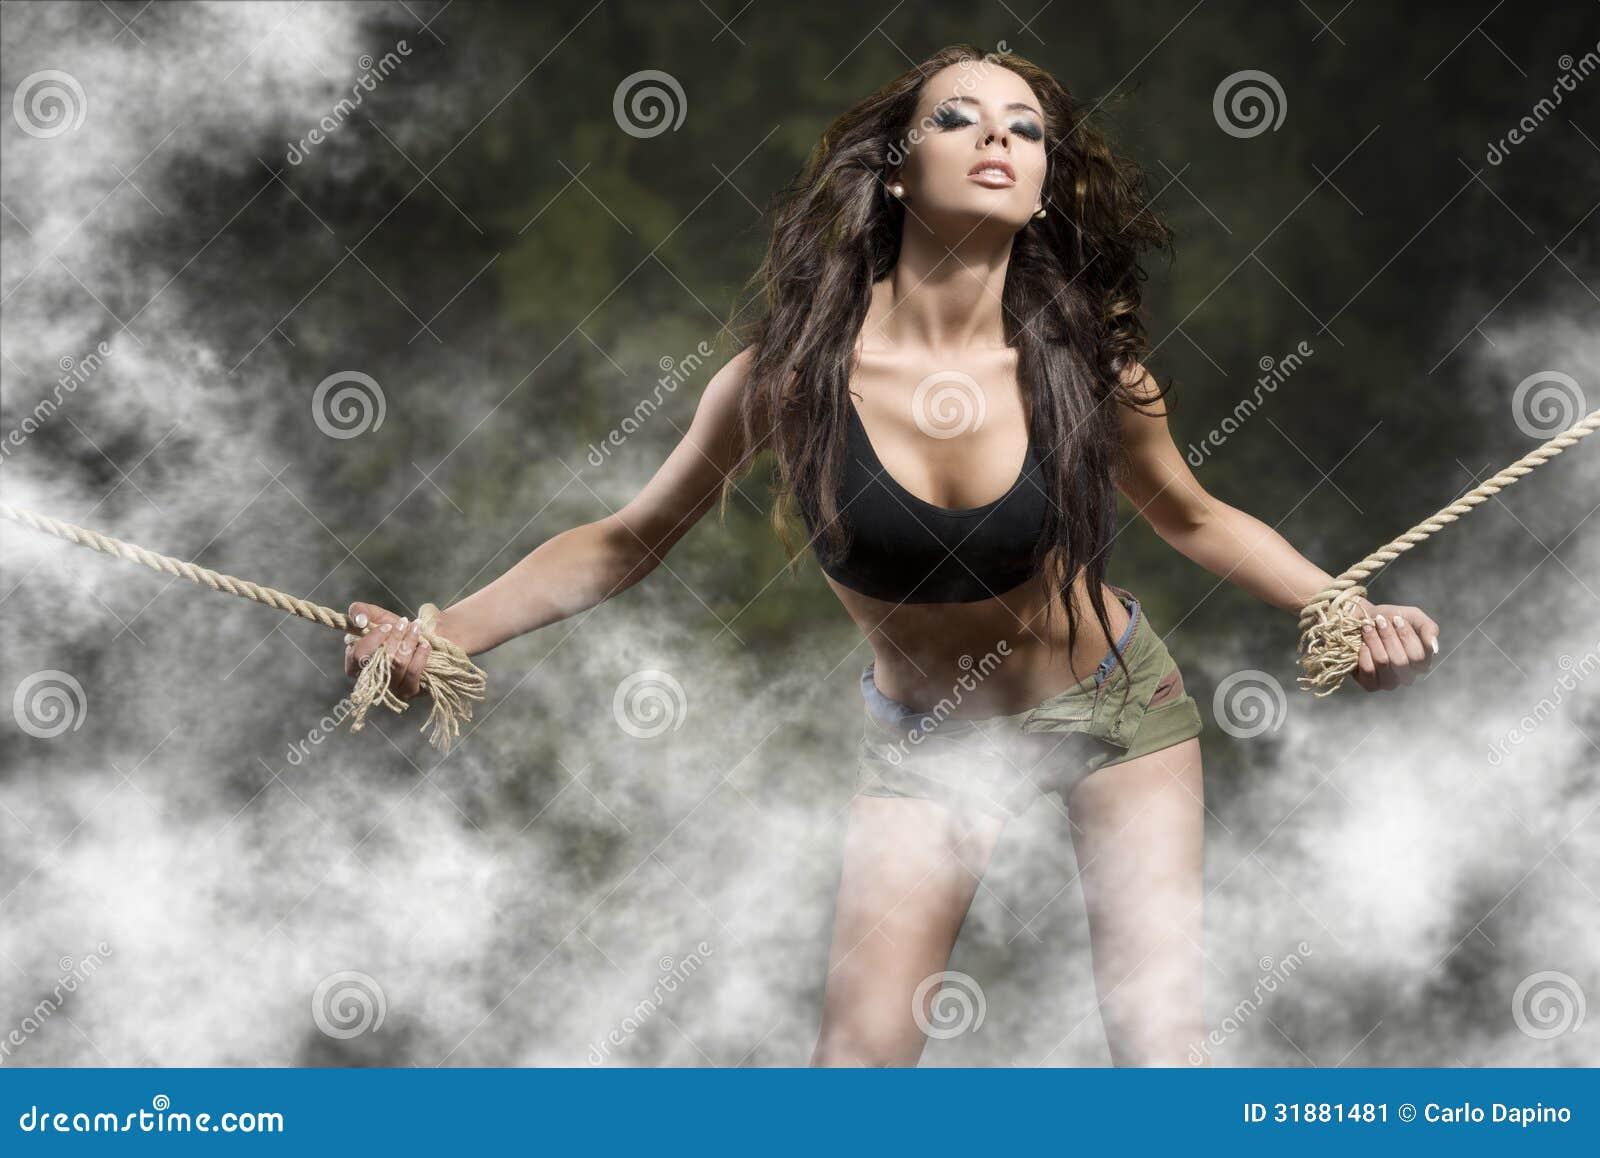 Chica atada en rack